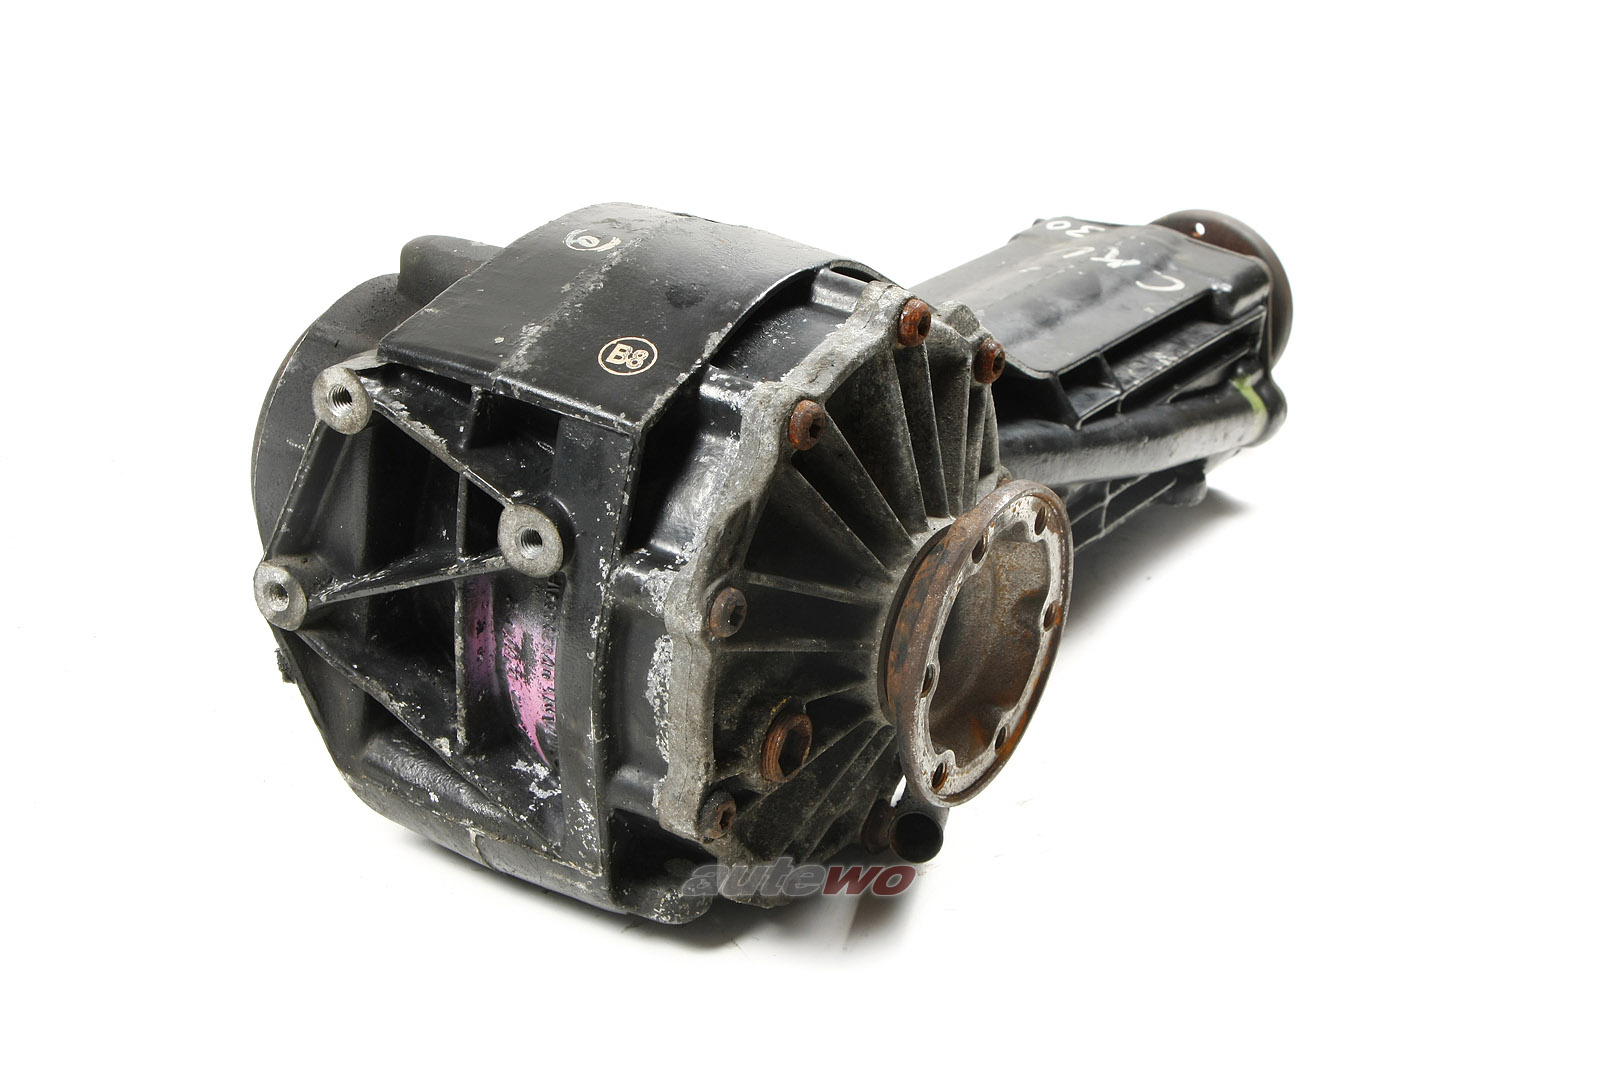 017500044G Audi A6/S6 C4 2.2/2.8l Differential CKL 24035